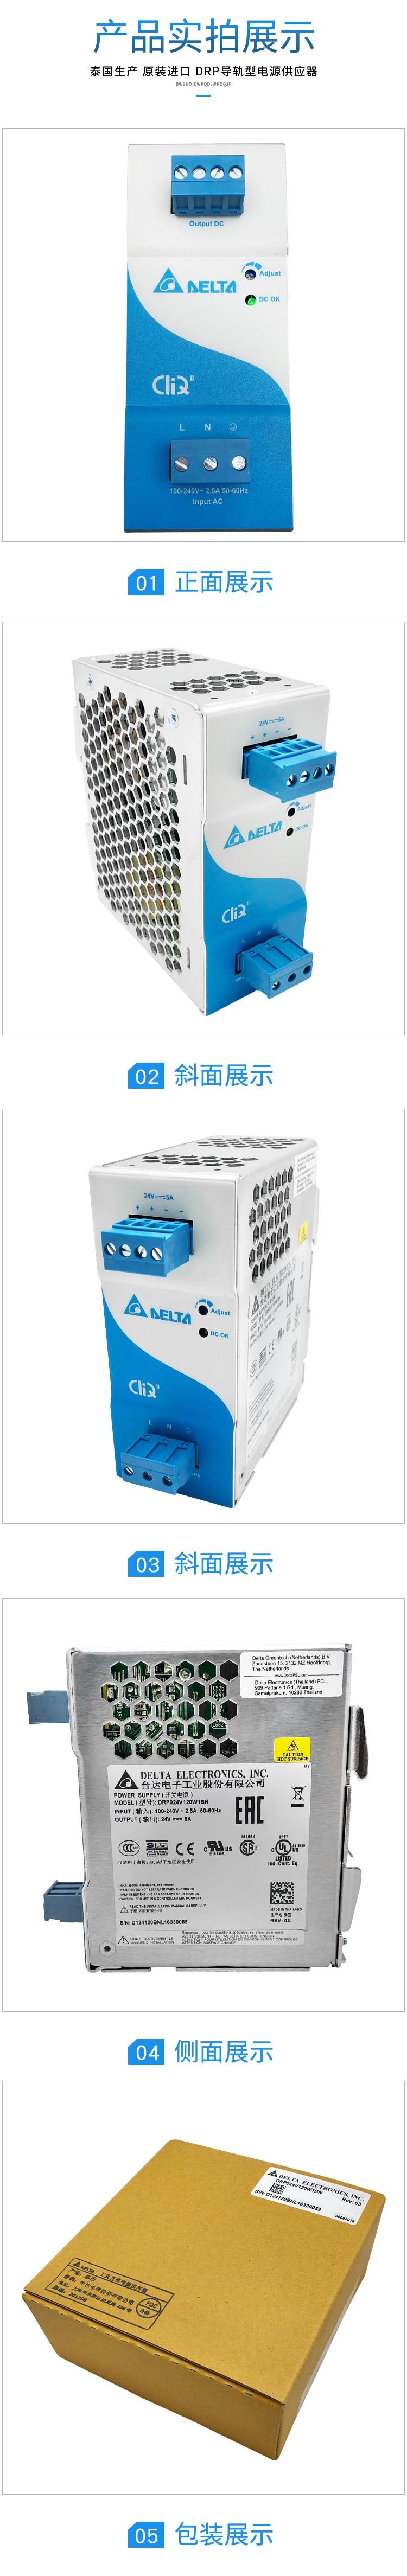 New in Box Delta Power Supply DRP024V120W1BN One Year Warranty!